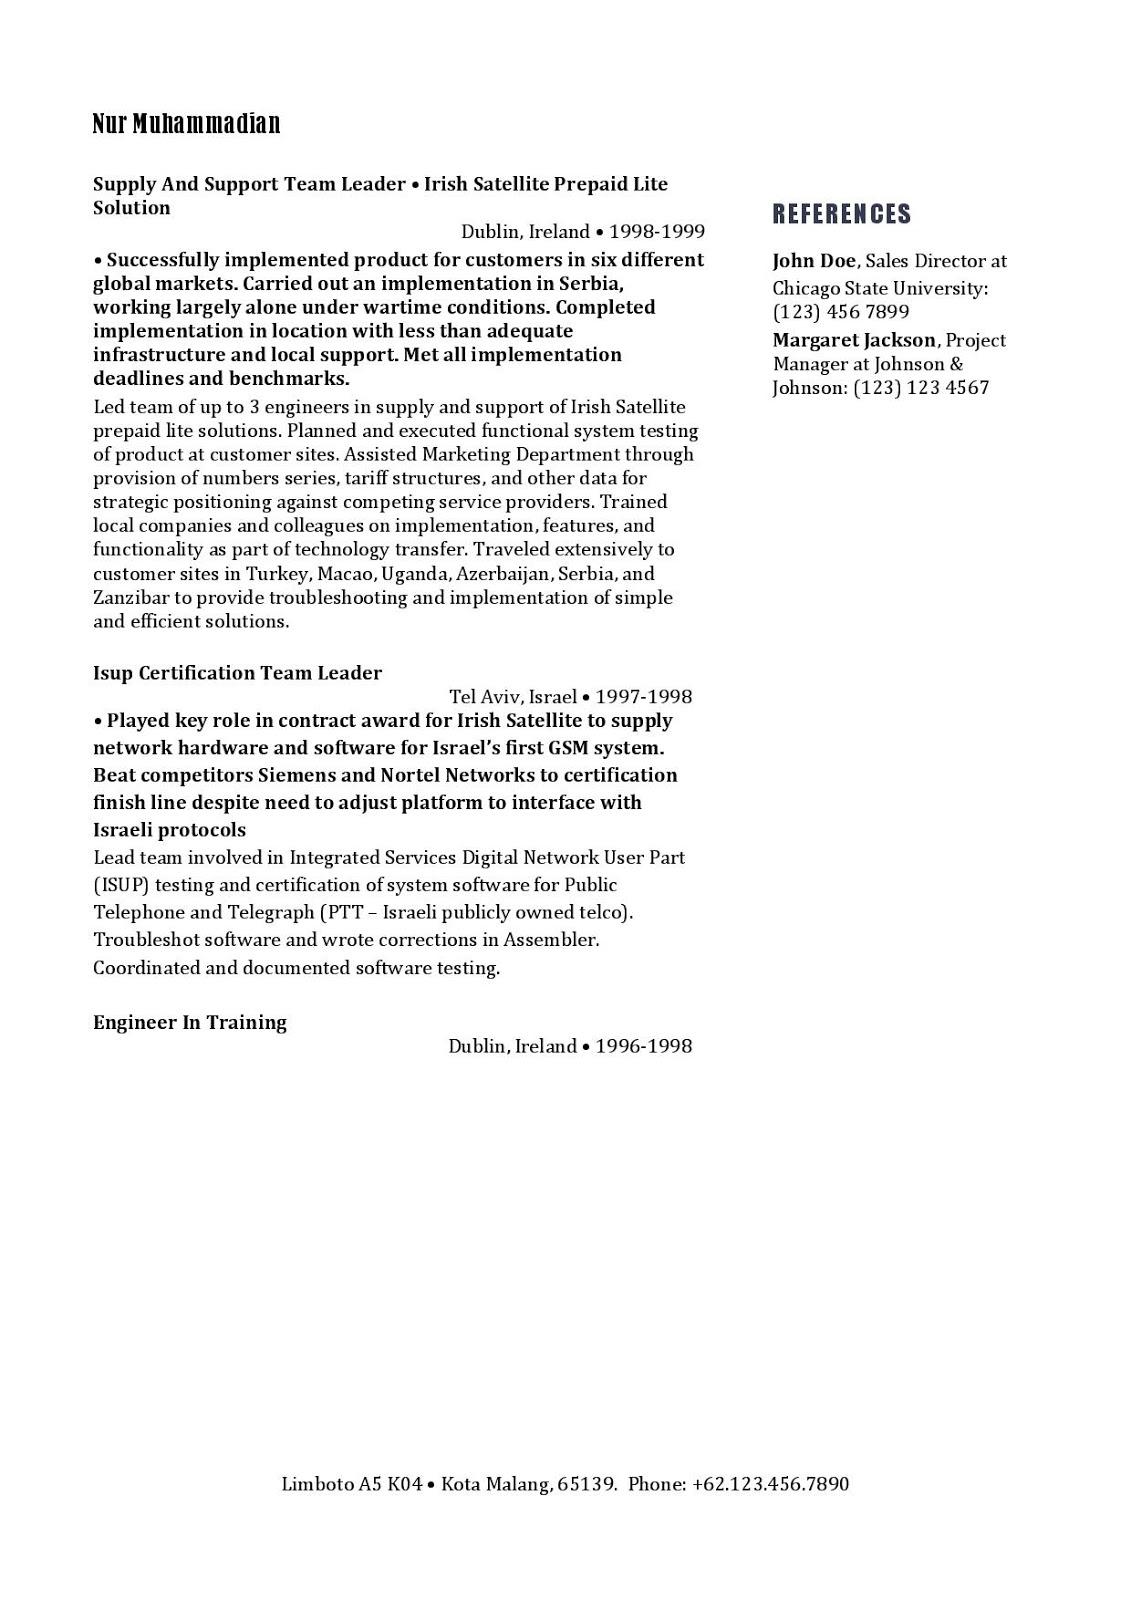 Contoh Resumecurriculum Vitae Teknisi Telekomunikasi